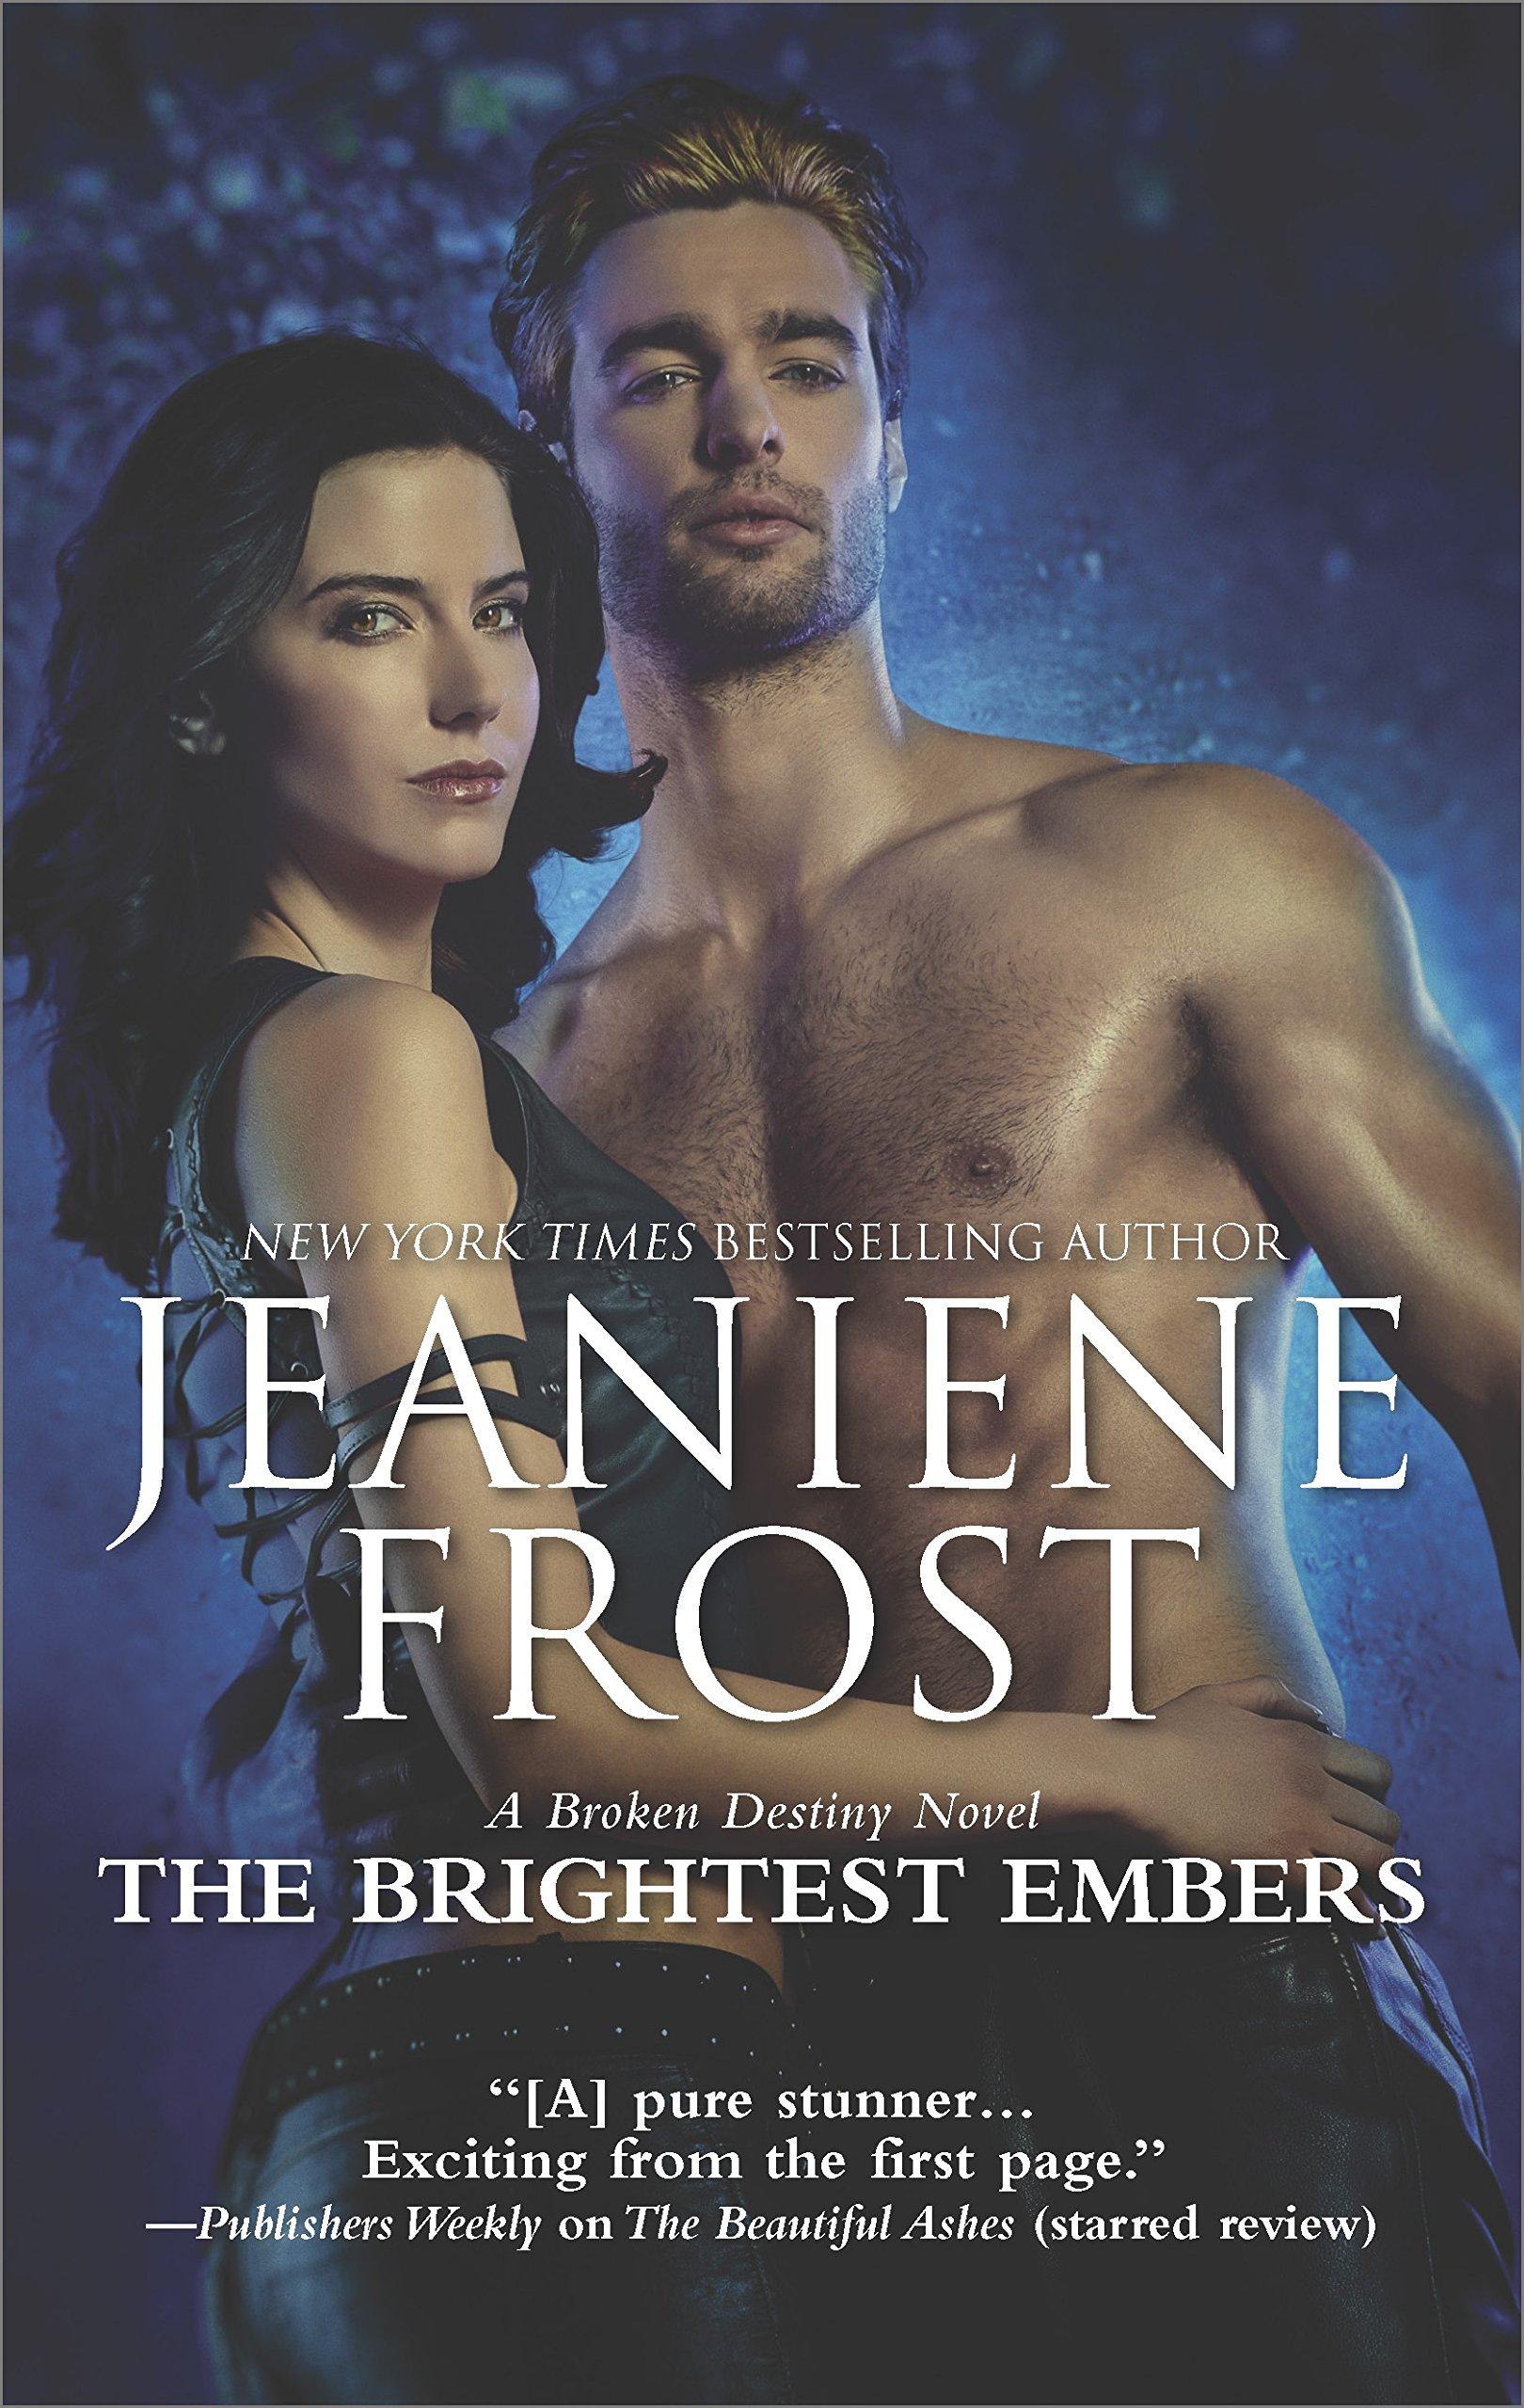 the-brightest-embers-a-paranormal-romance-novel-a-broken-destiny-novel